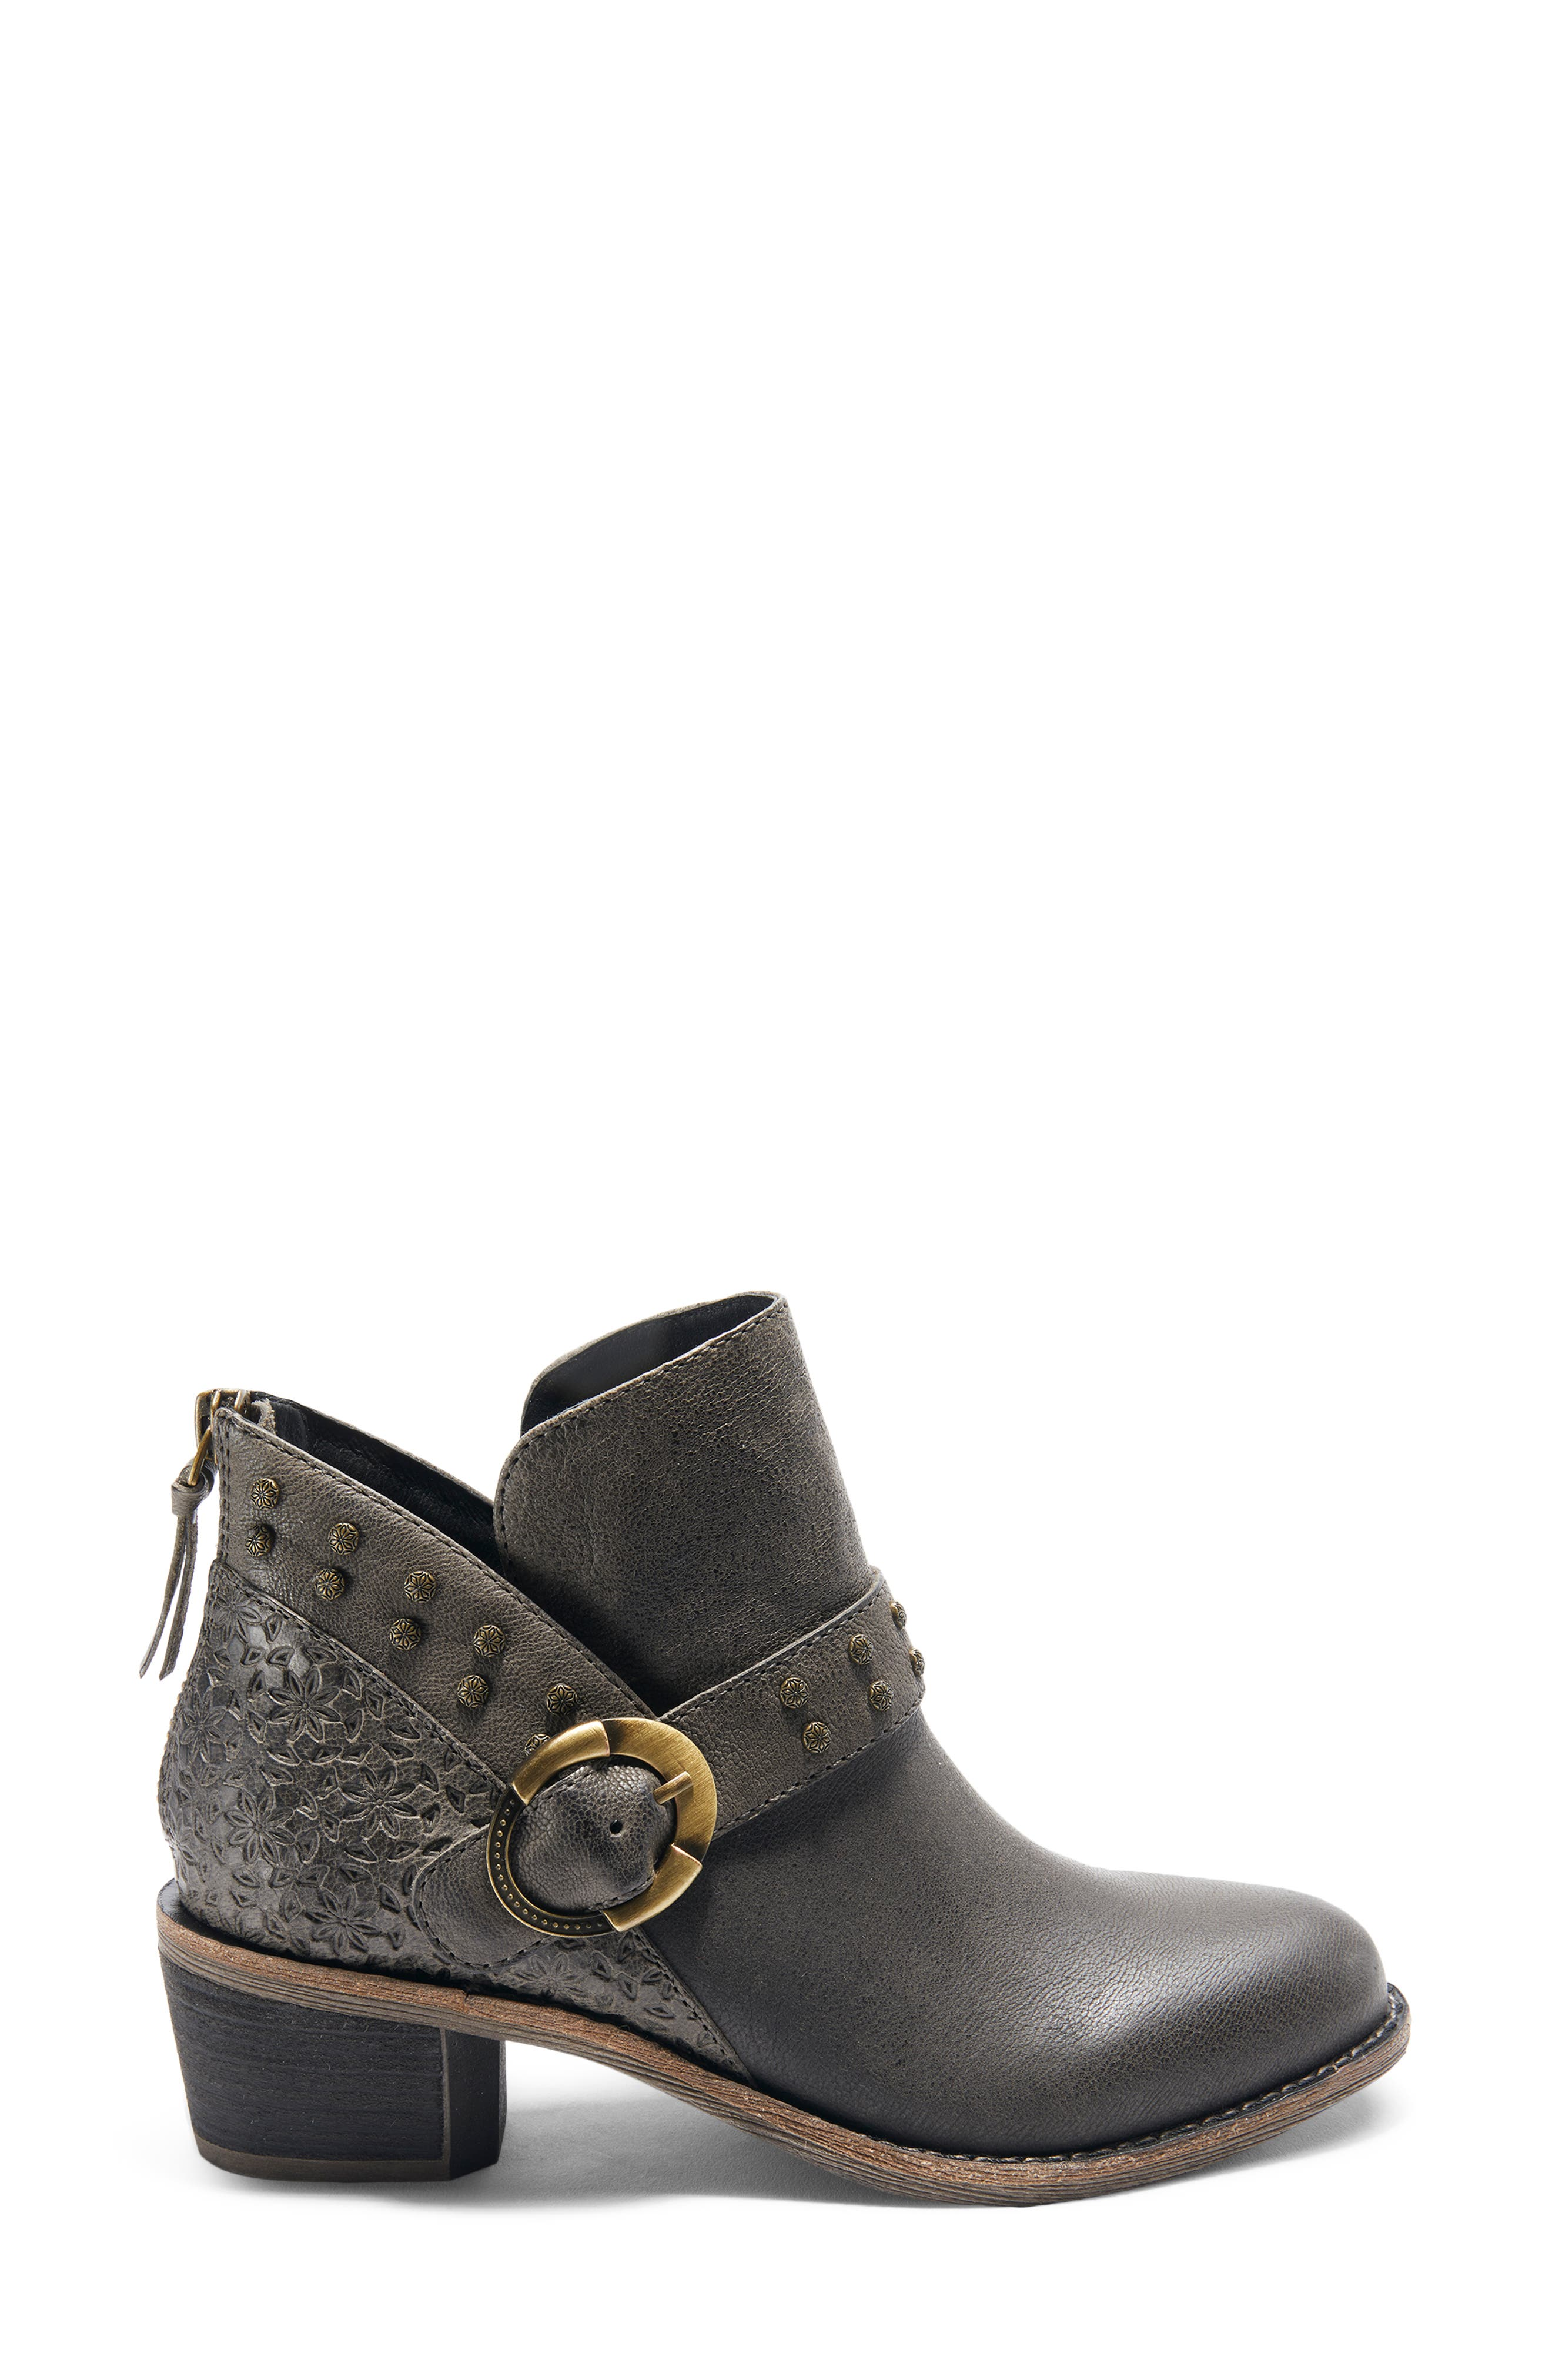 Halsa Footwear Melania Bootie